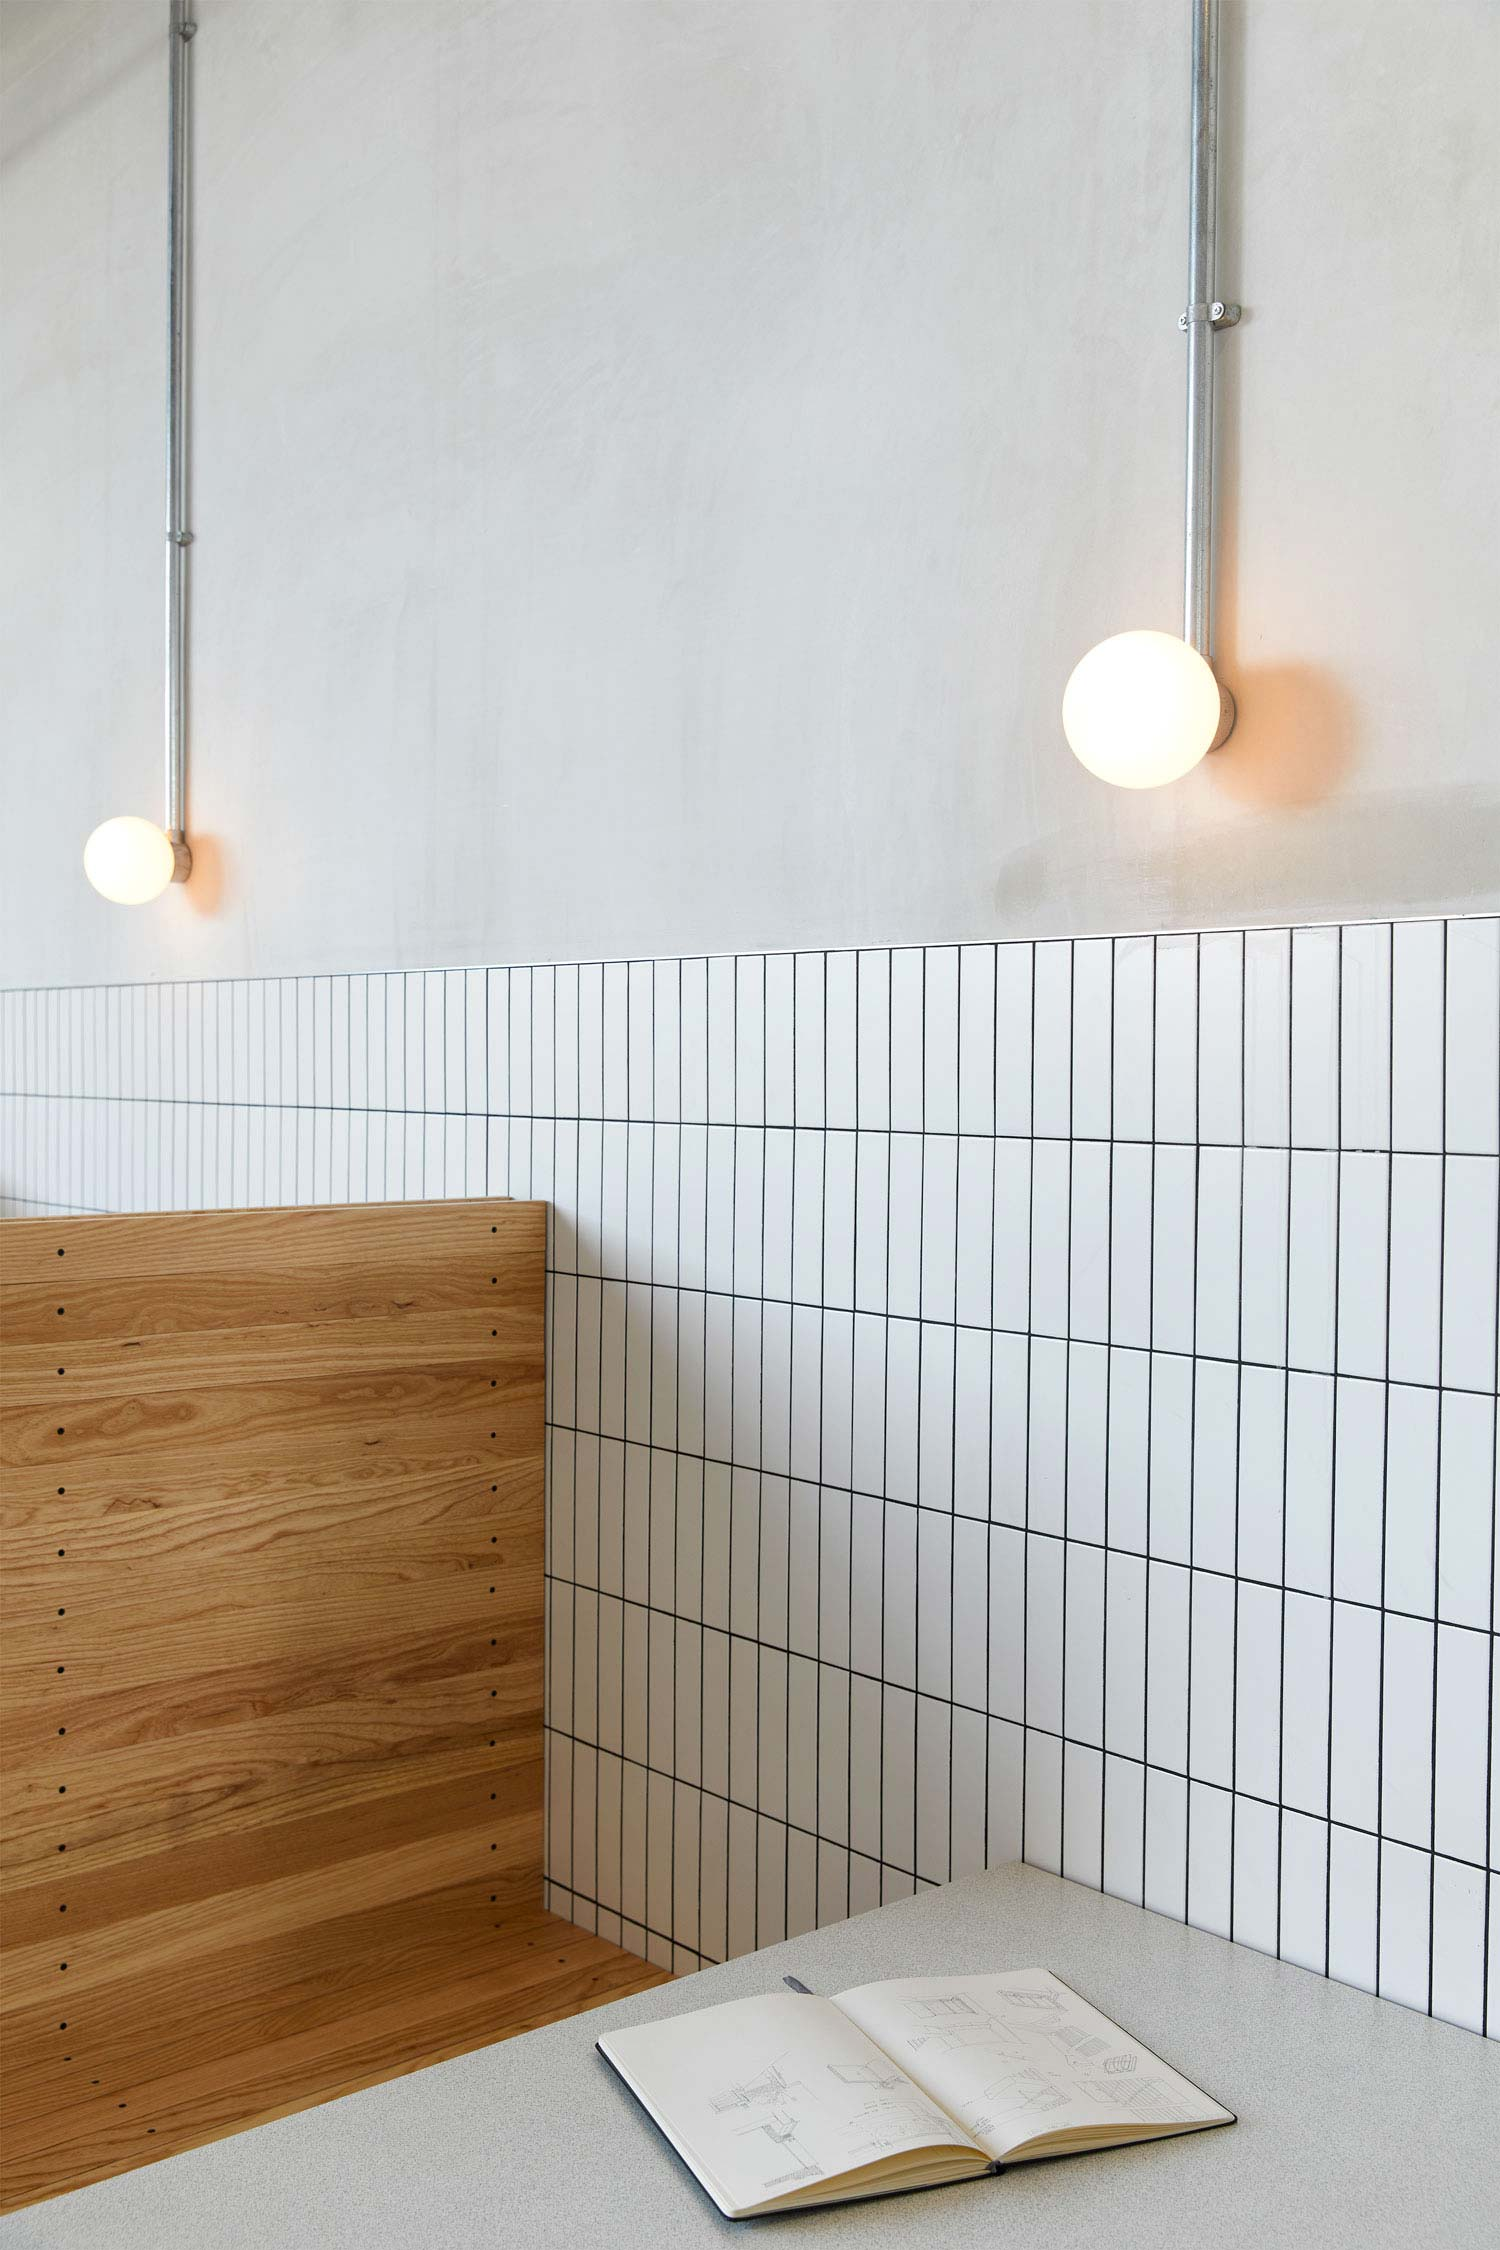 Architecture-London-Design-Freehaus-Workspace-Imperial-College-4.jpg